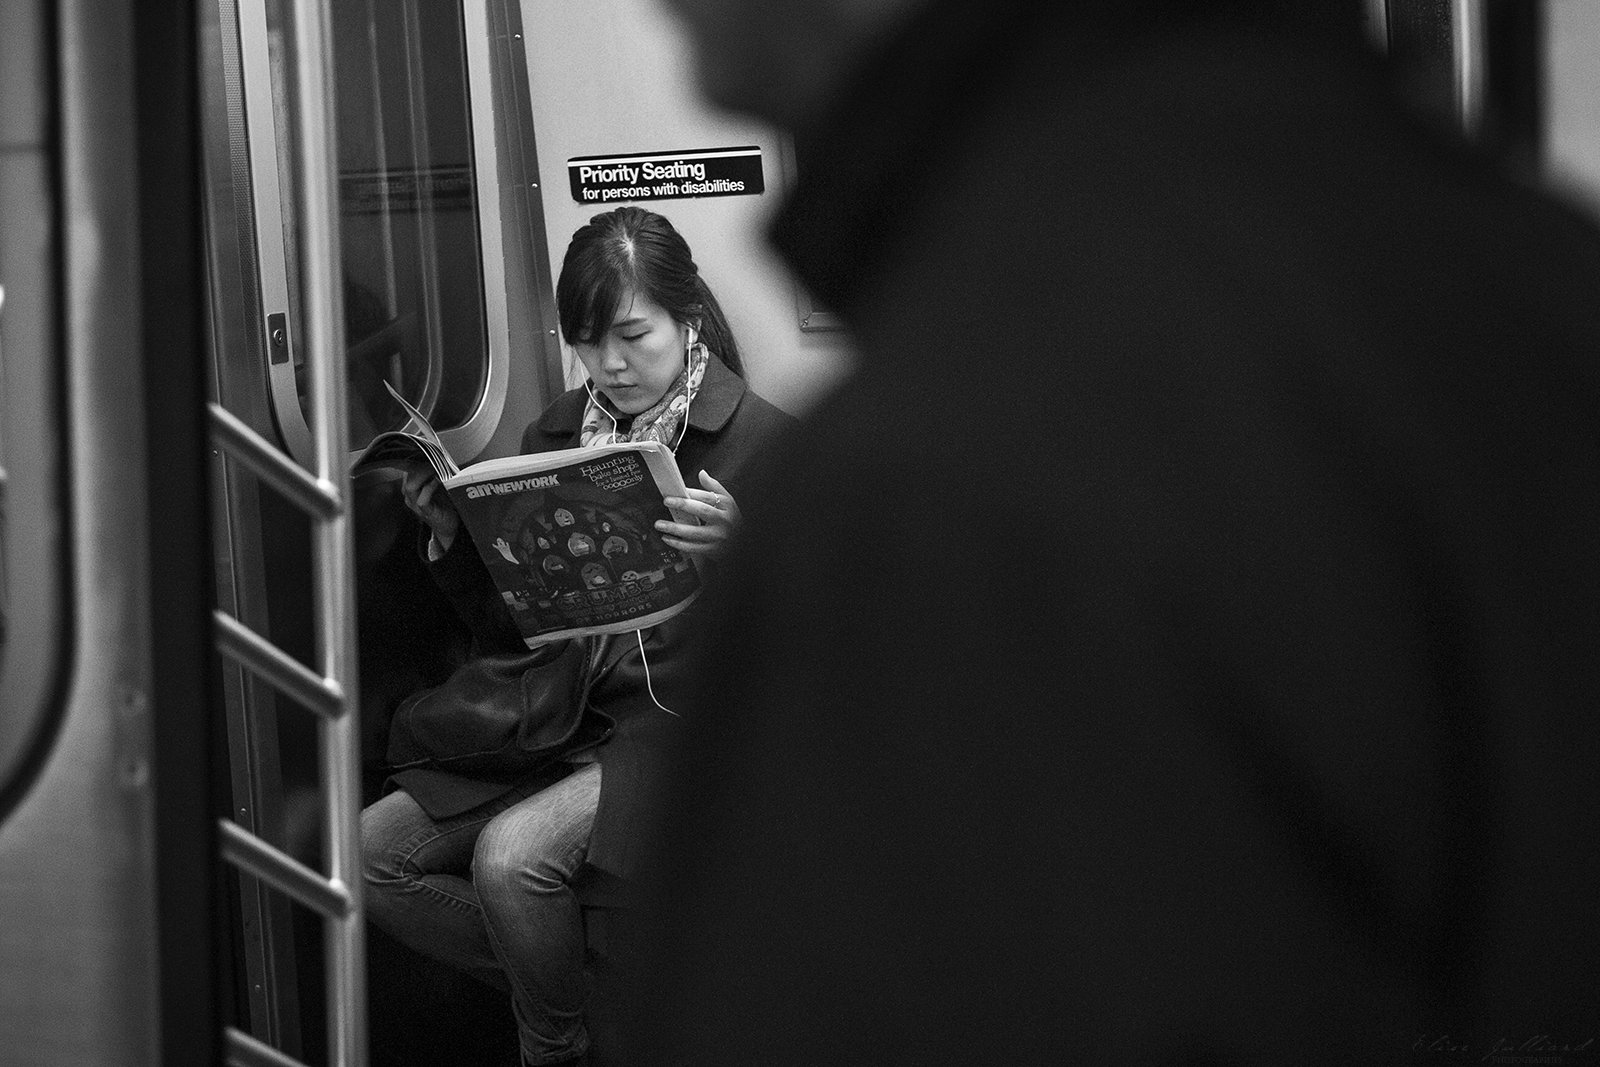 elise-julliard-photographe-photo-new-york-usa-etats-unis-amerique-metro